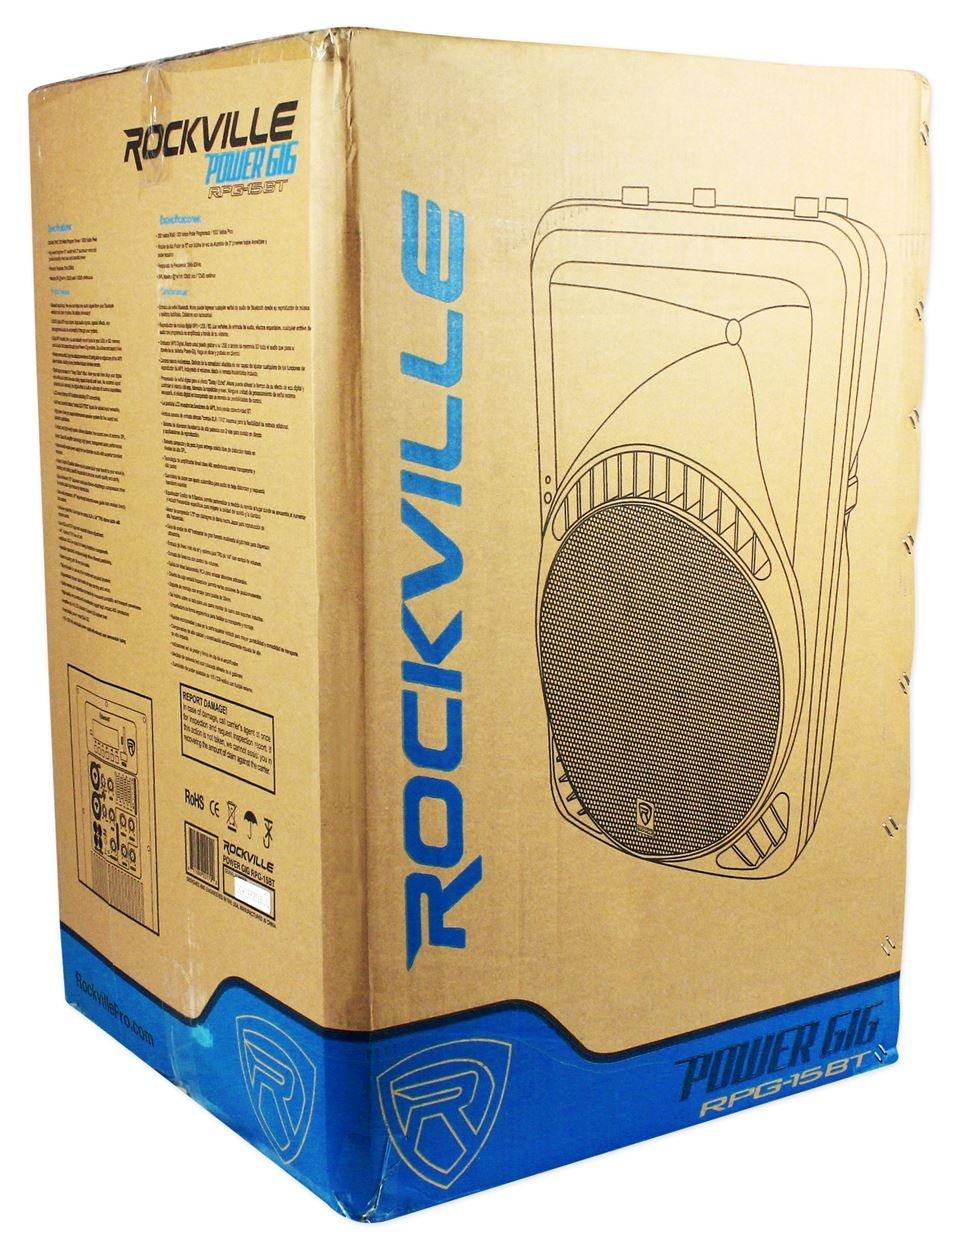 Rockville 15'' Powered 1000W DJ PA Speaker BlueTooth, USB, SD, EQ, Remote (RPG15BT) by Rockville (Image #7)